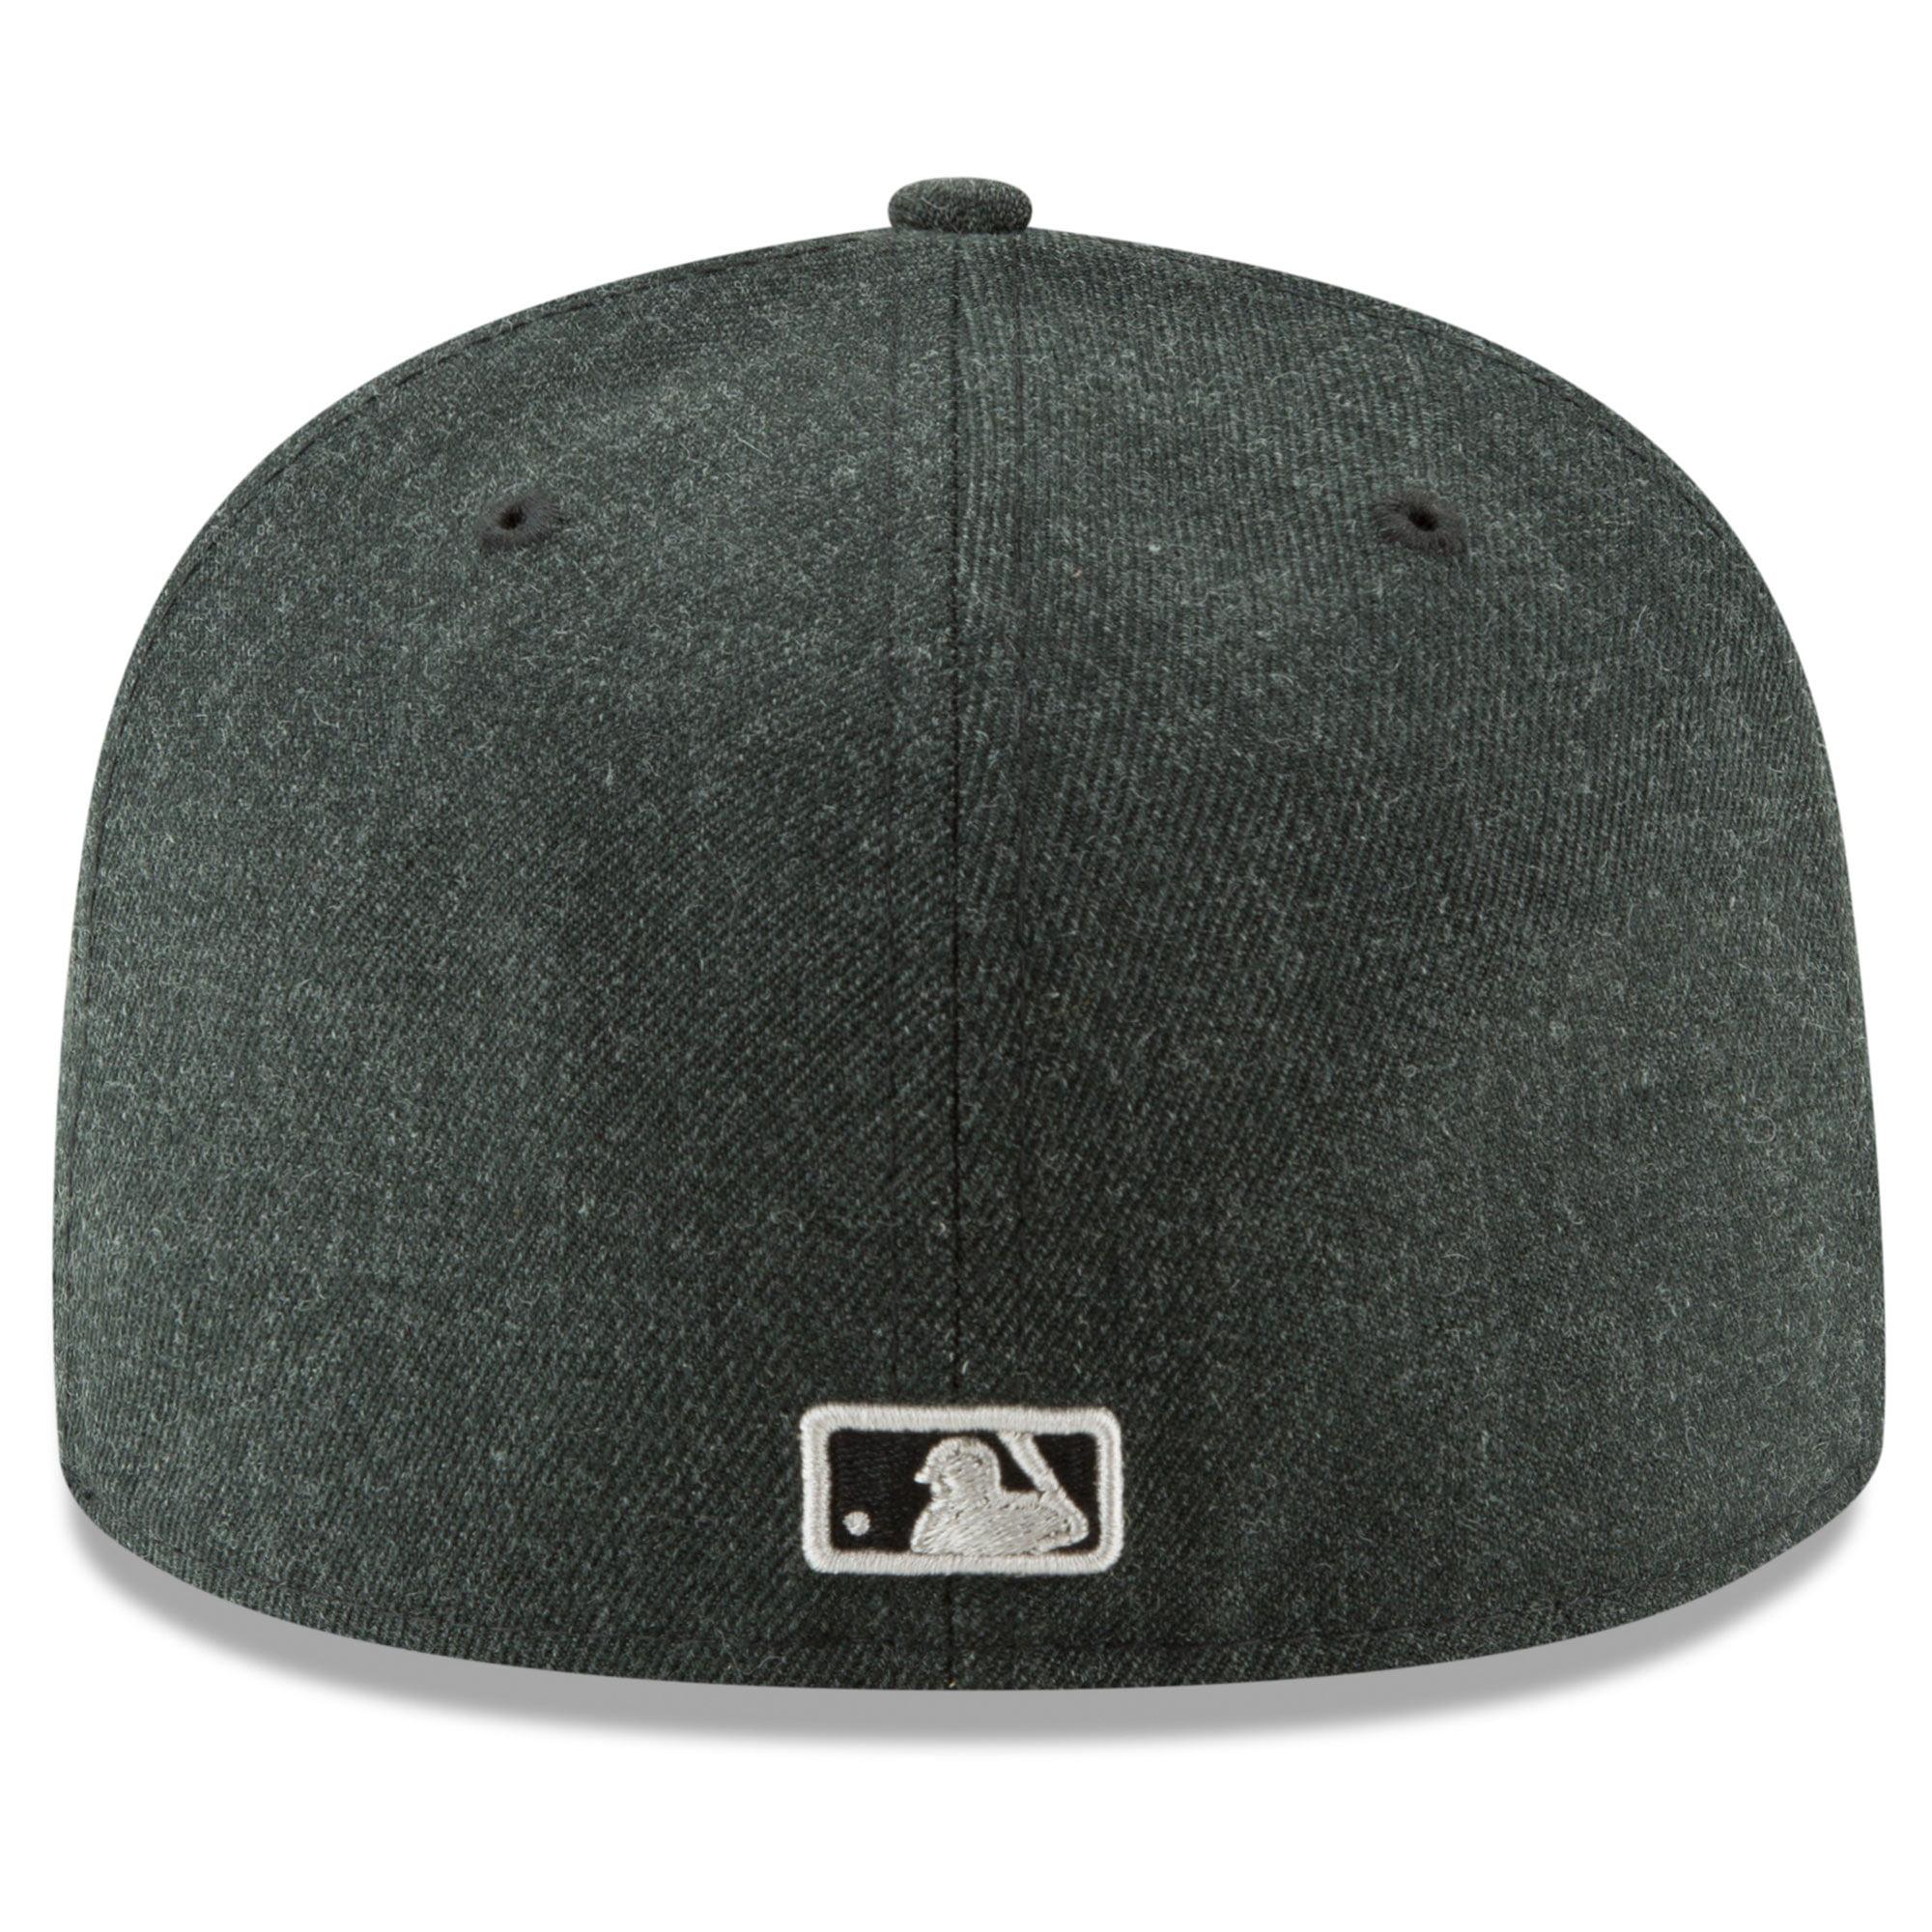 big sale 58a40 d2eae Detroit Tigers New Era Bold 59FIFTY Fitted Hat - Heathered Black -  Walmart.com